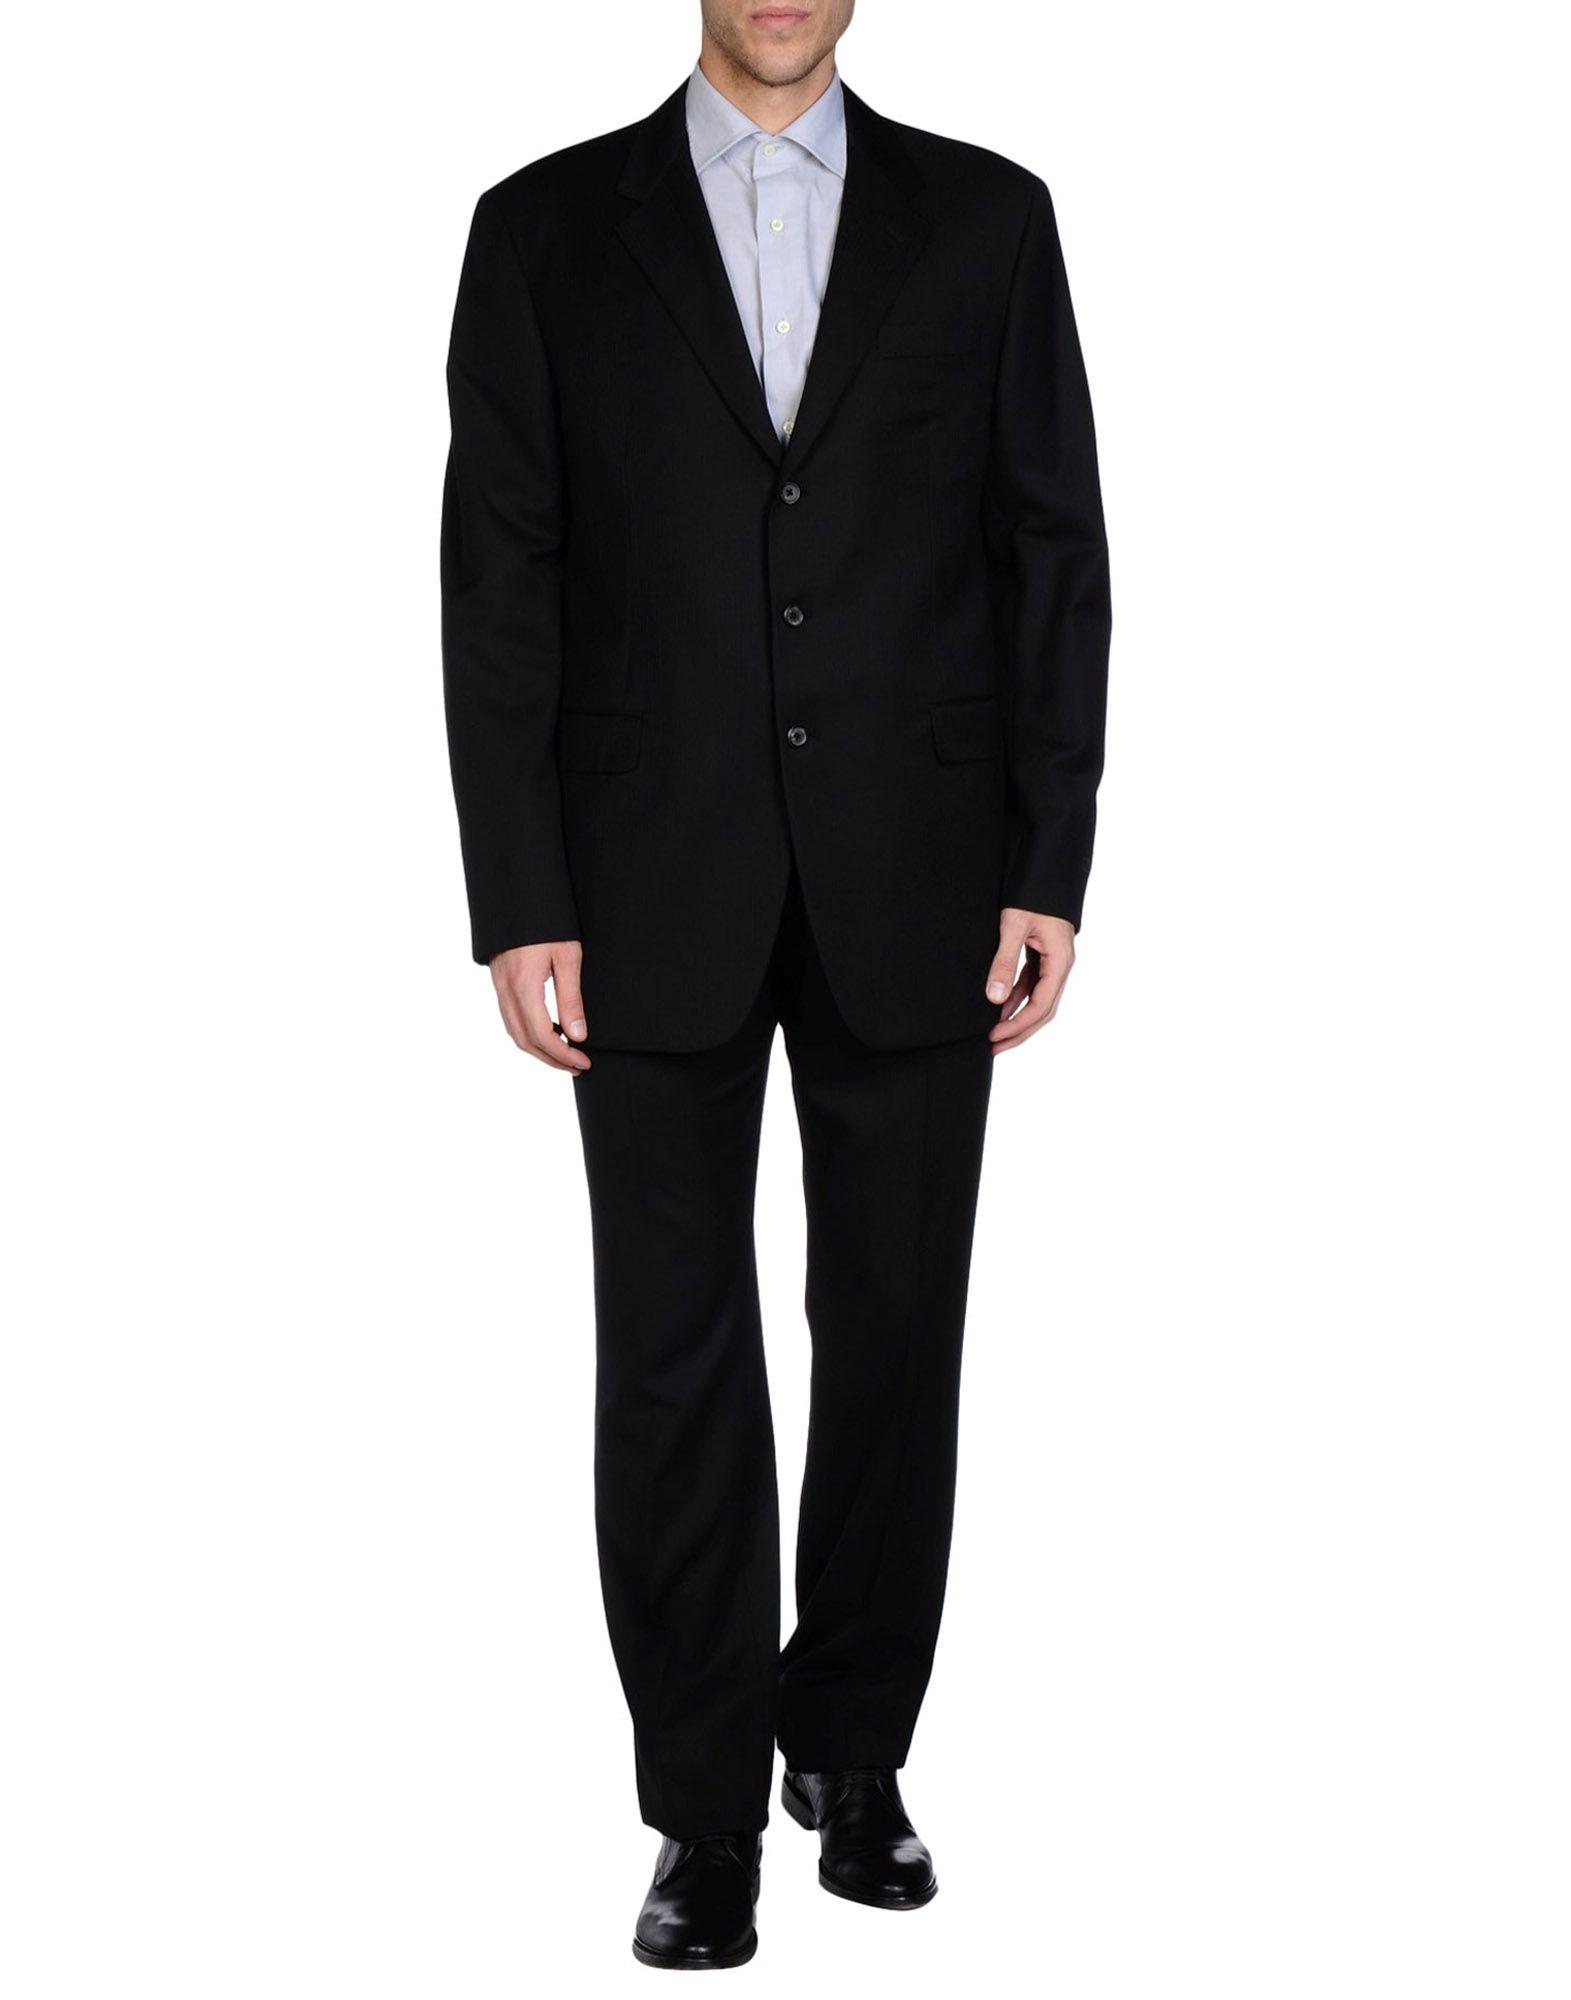 Prada Mens Suits 121